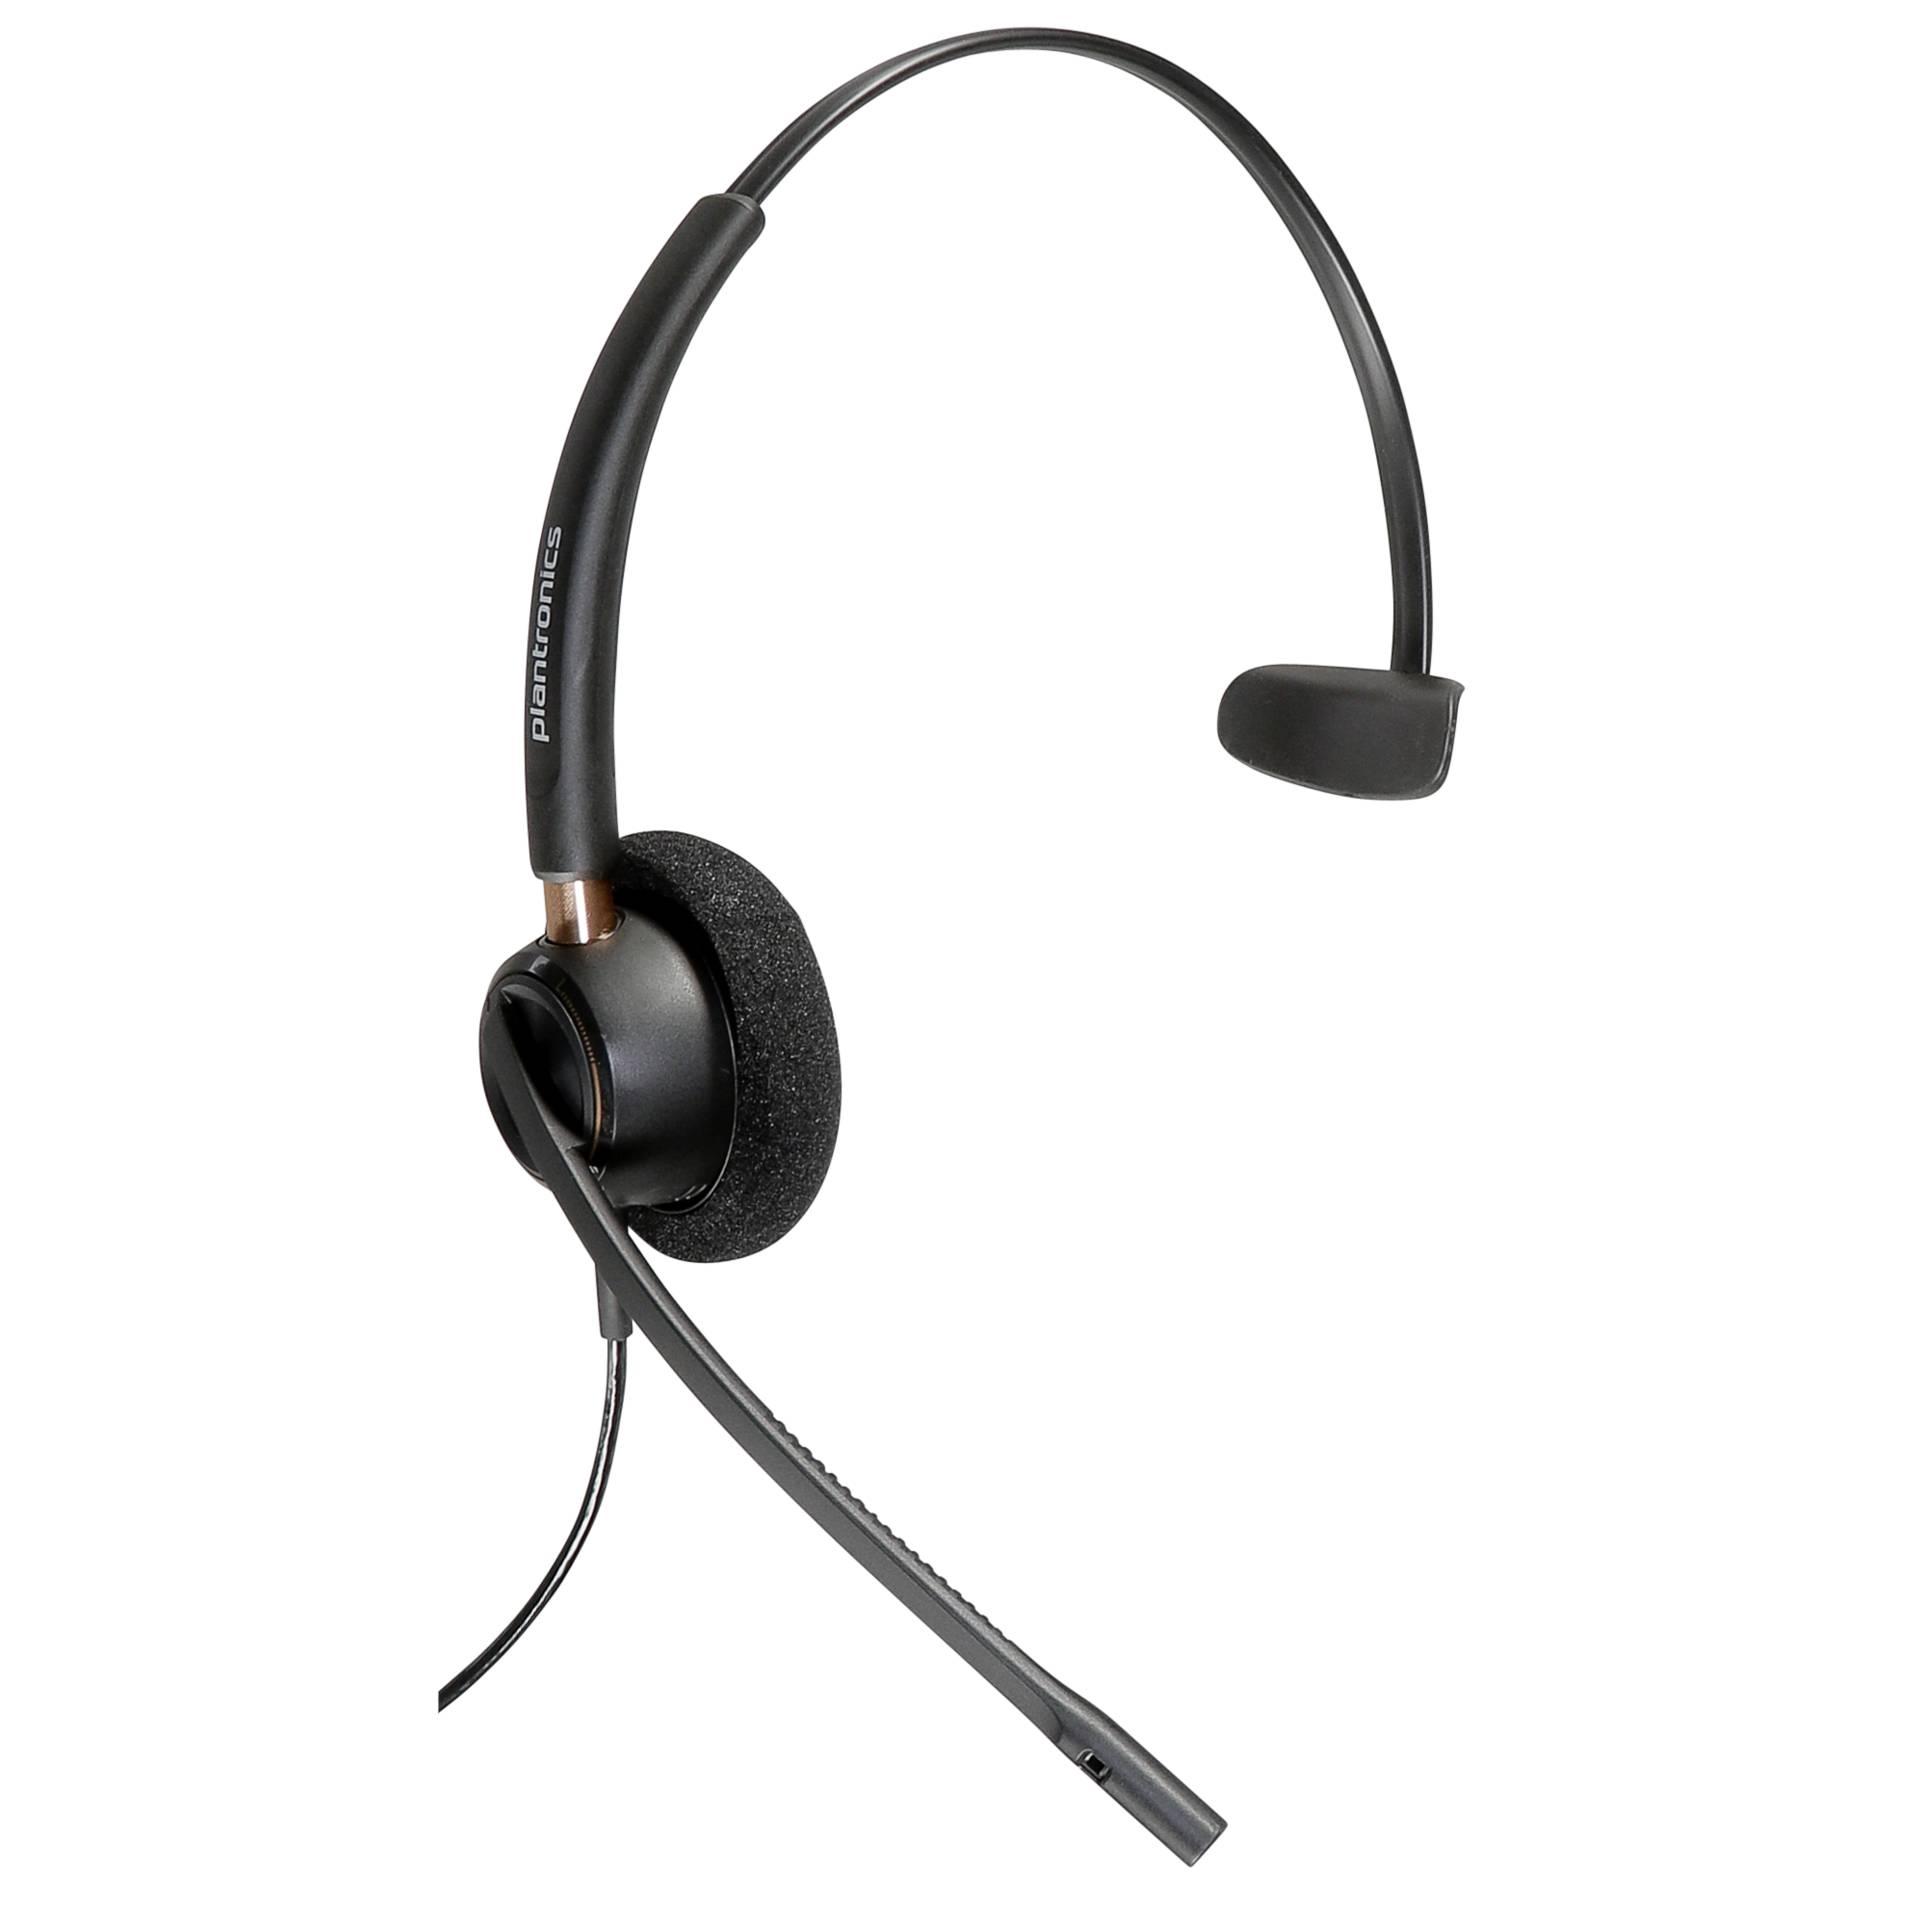 Plantronics EncorePro HW510 On-Ear Headset wired